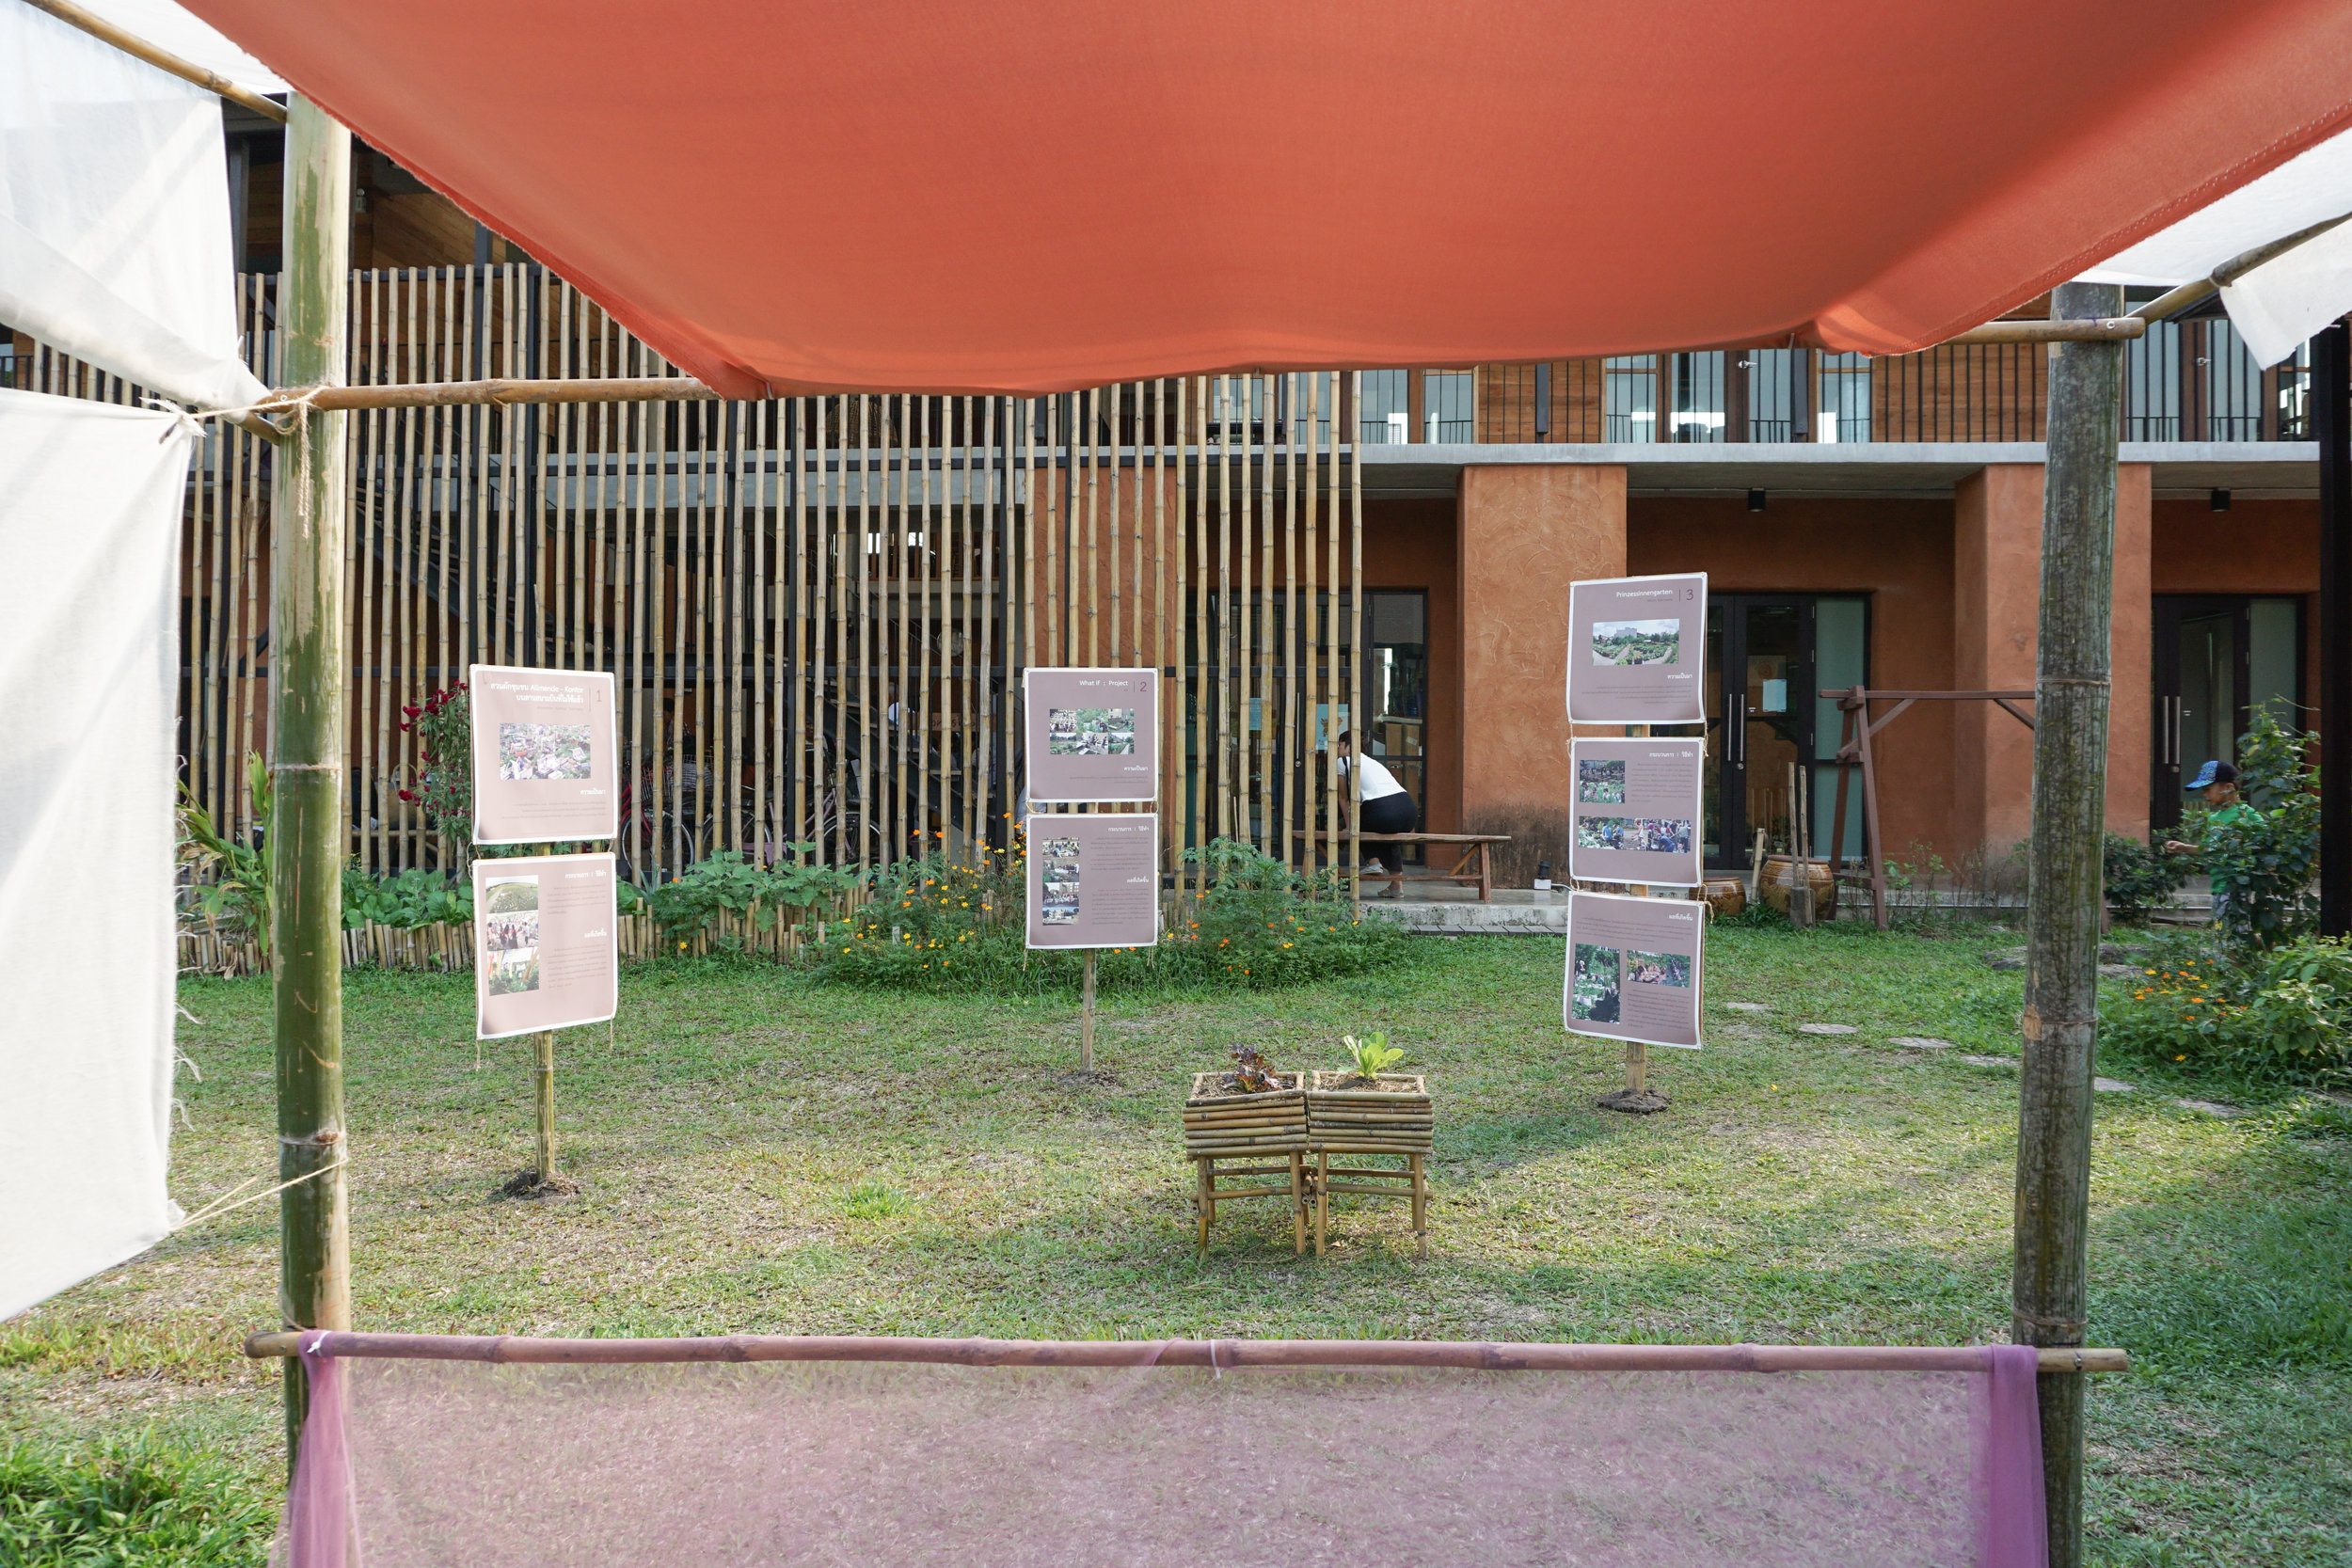 The urban farming exhibition at the Thai City Farm Festival in Nonthaburi province